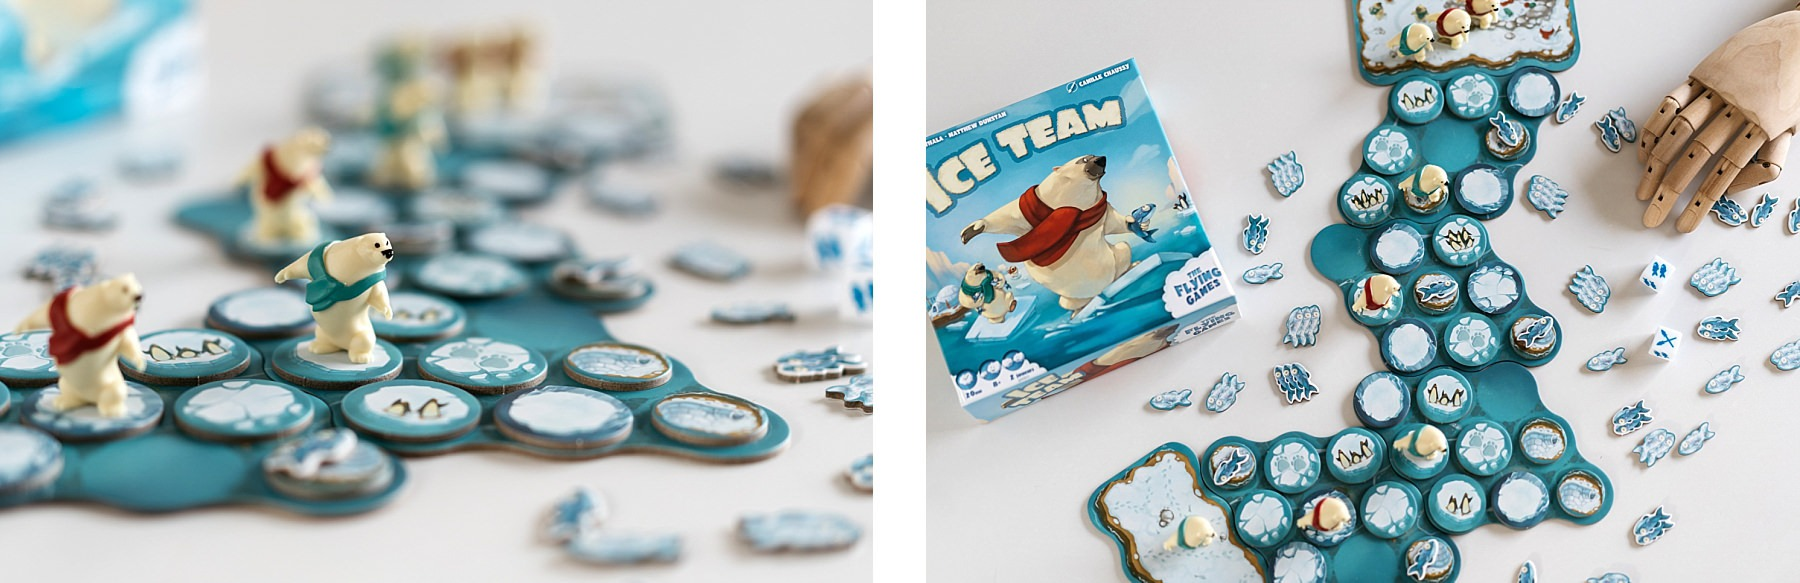 Ice team The flying games jeu de société